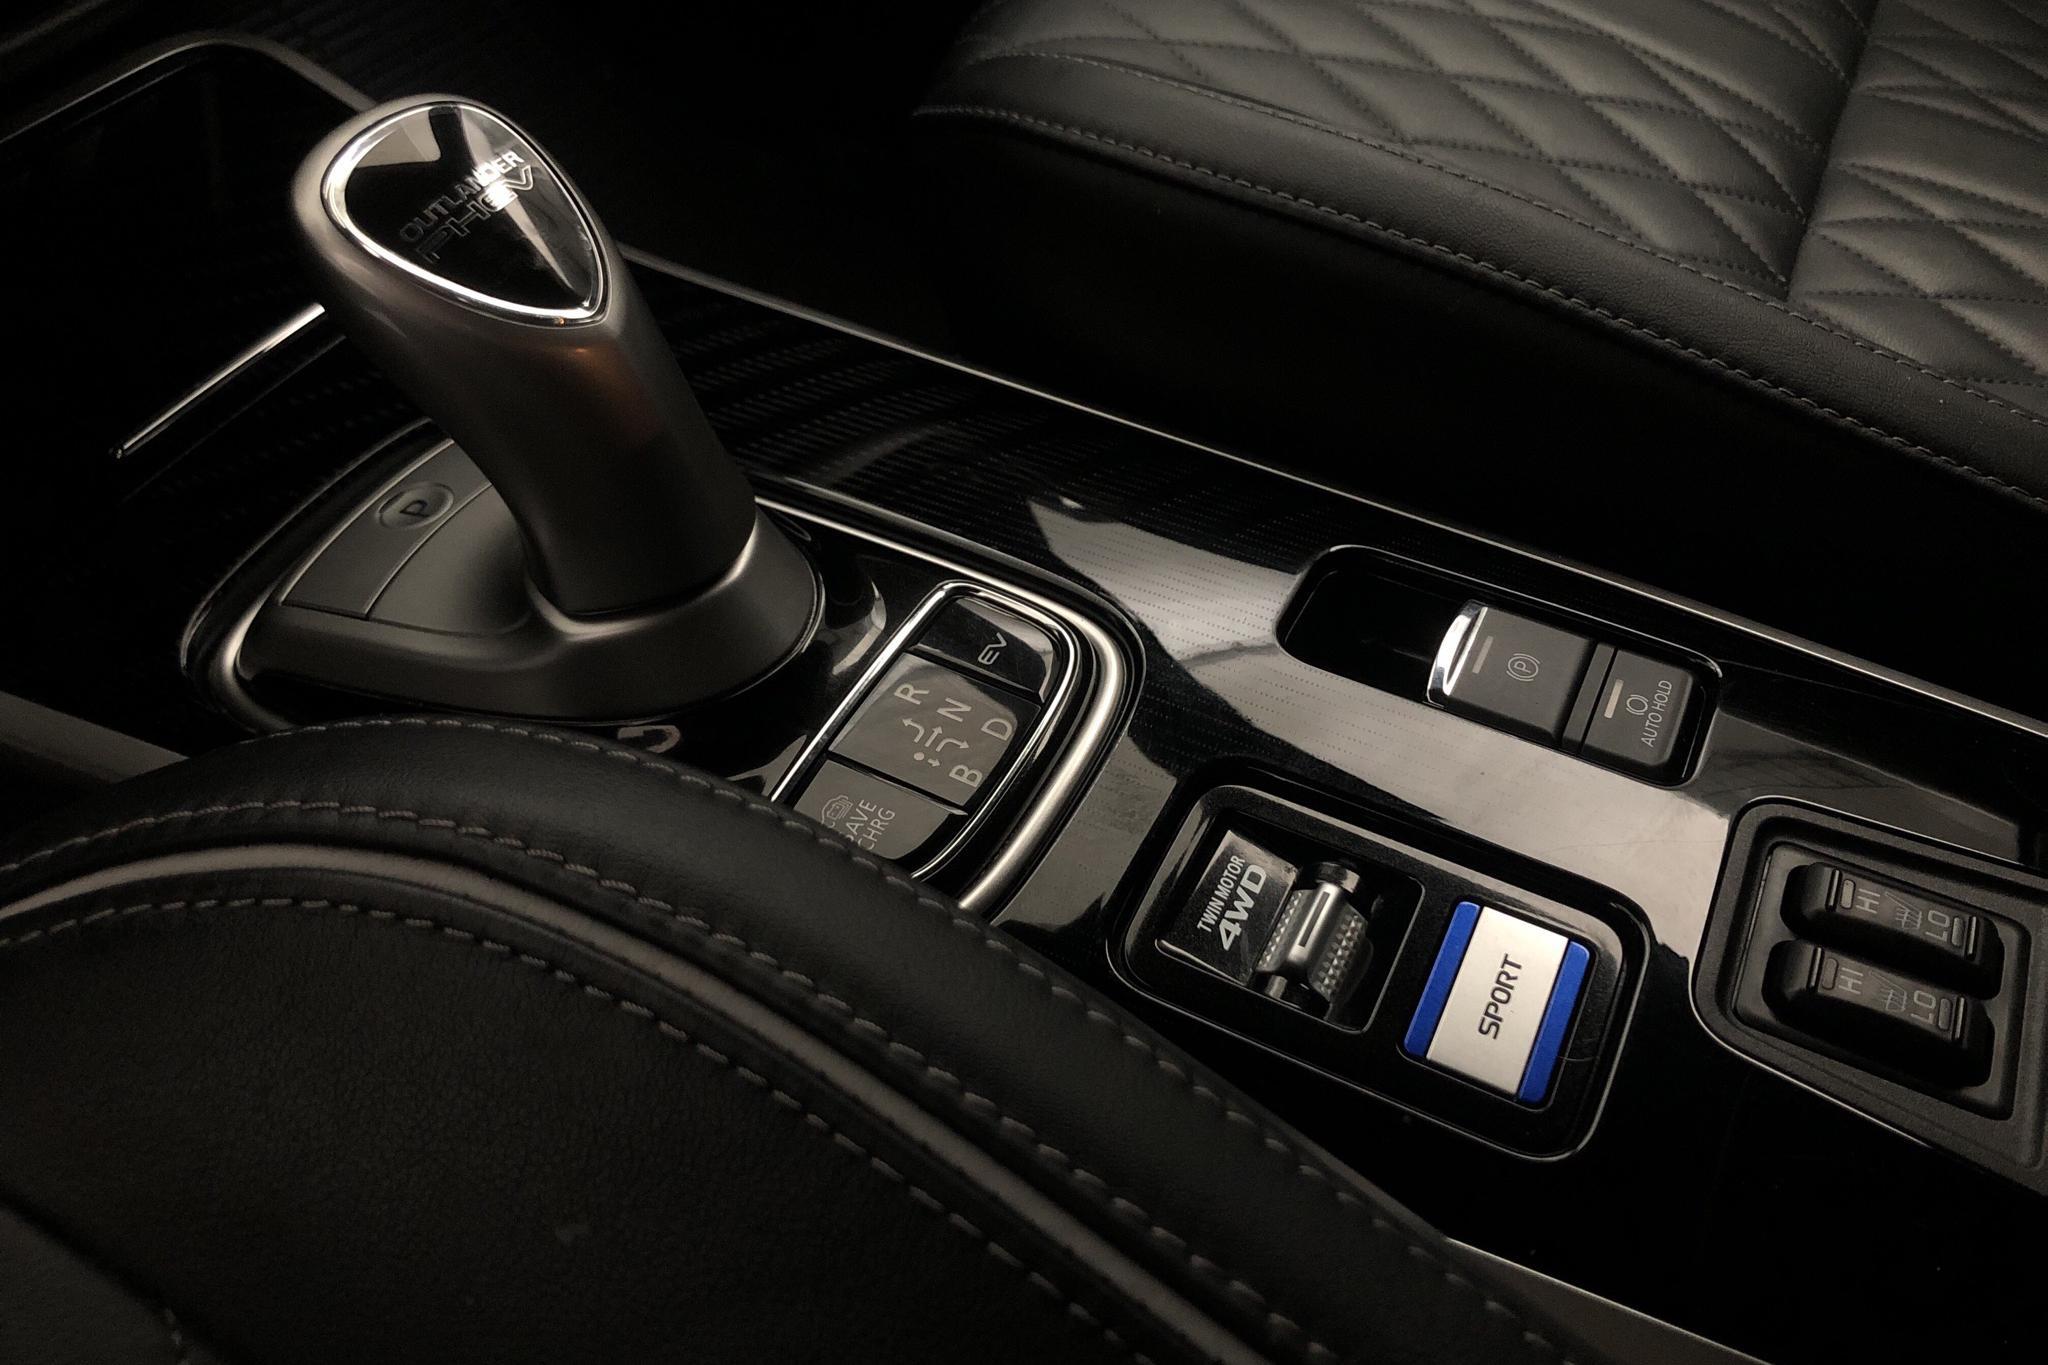 Mitsubishi Outlander 2.4 Plug-in Hybrid 4WD (136hk) - 40 290 km - Automatic - black - 2020